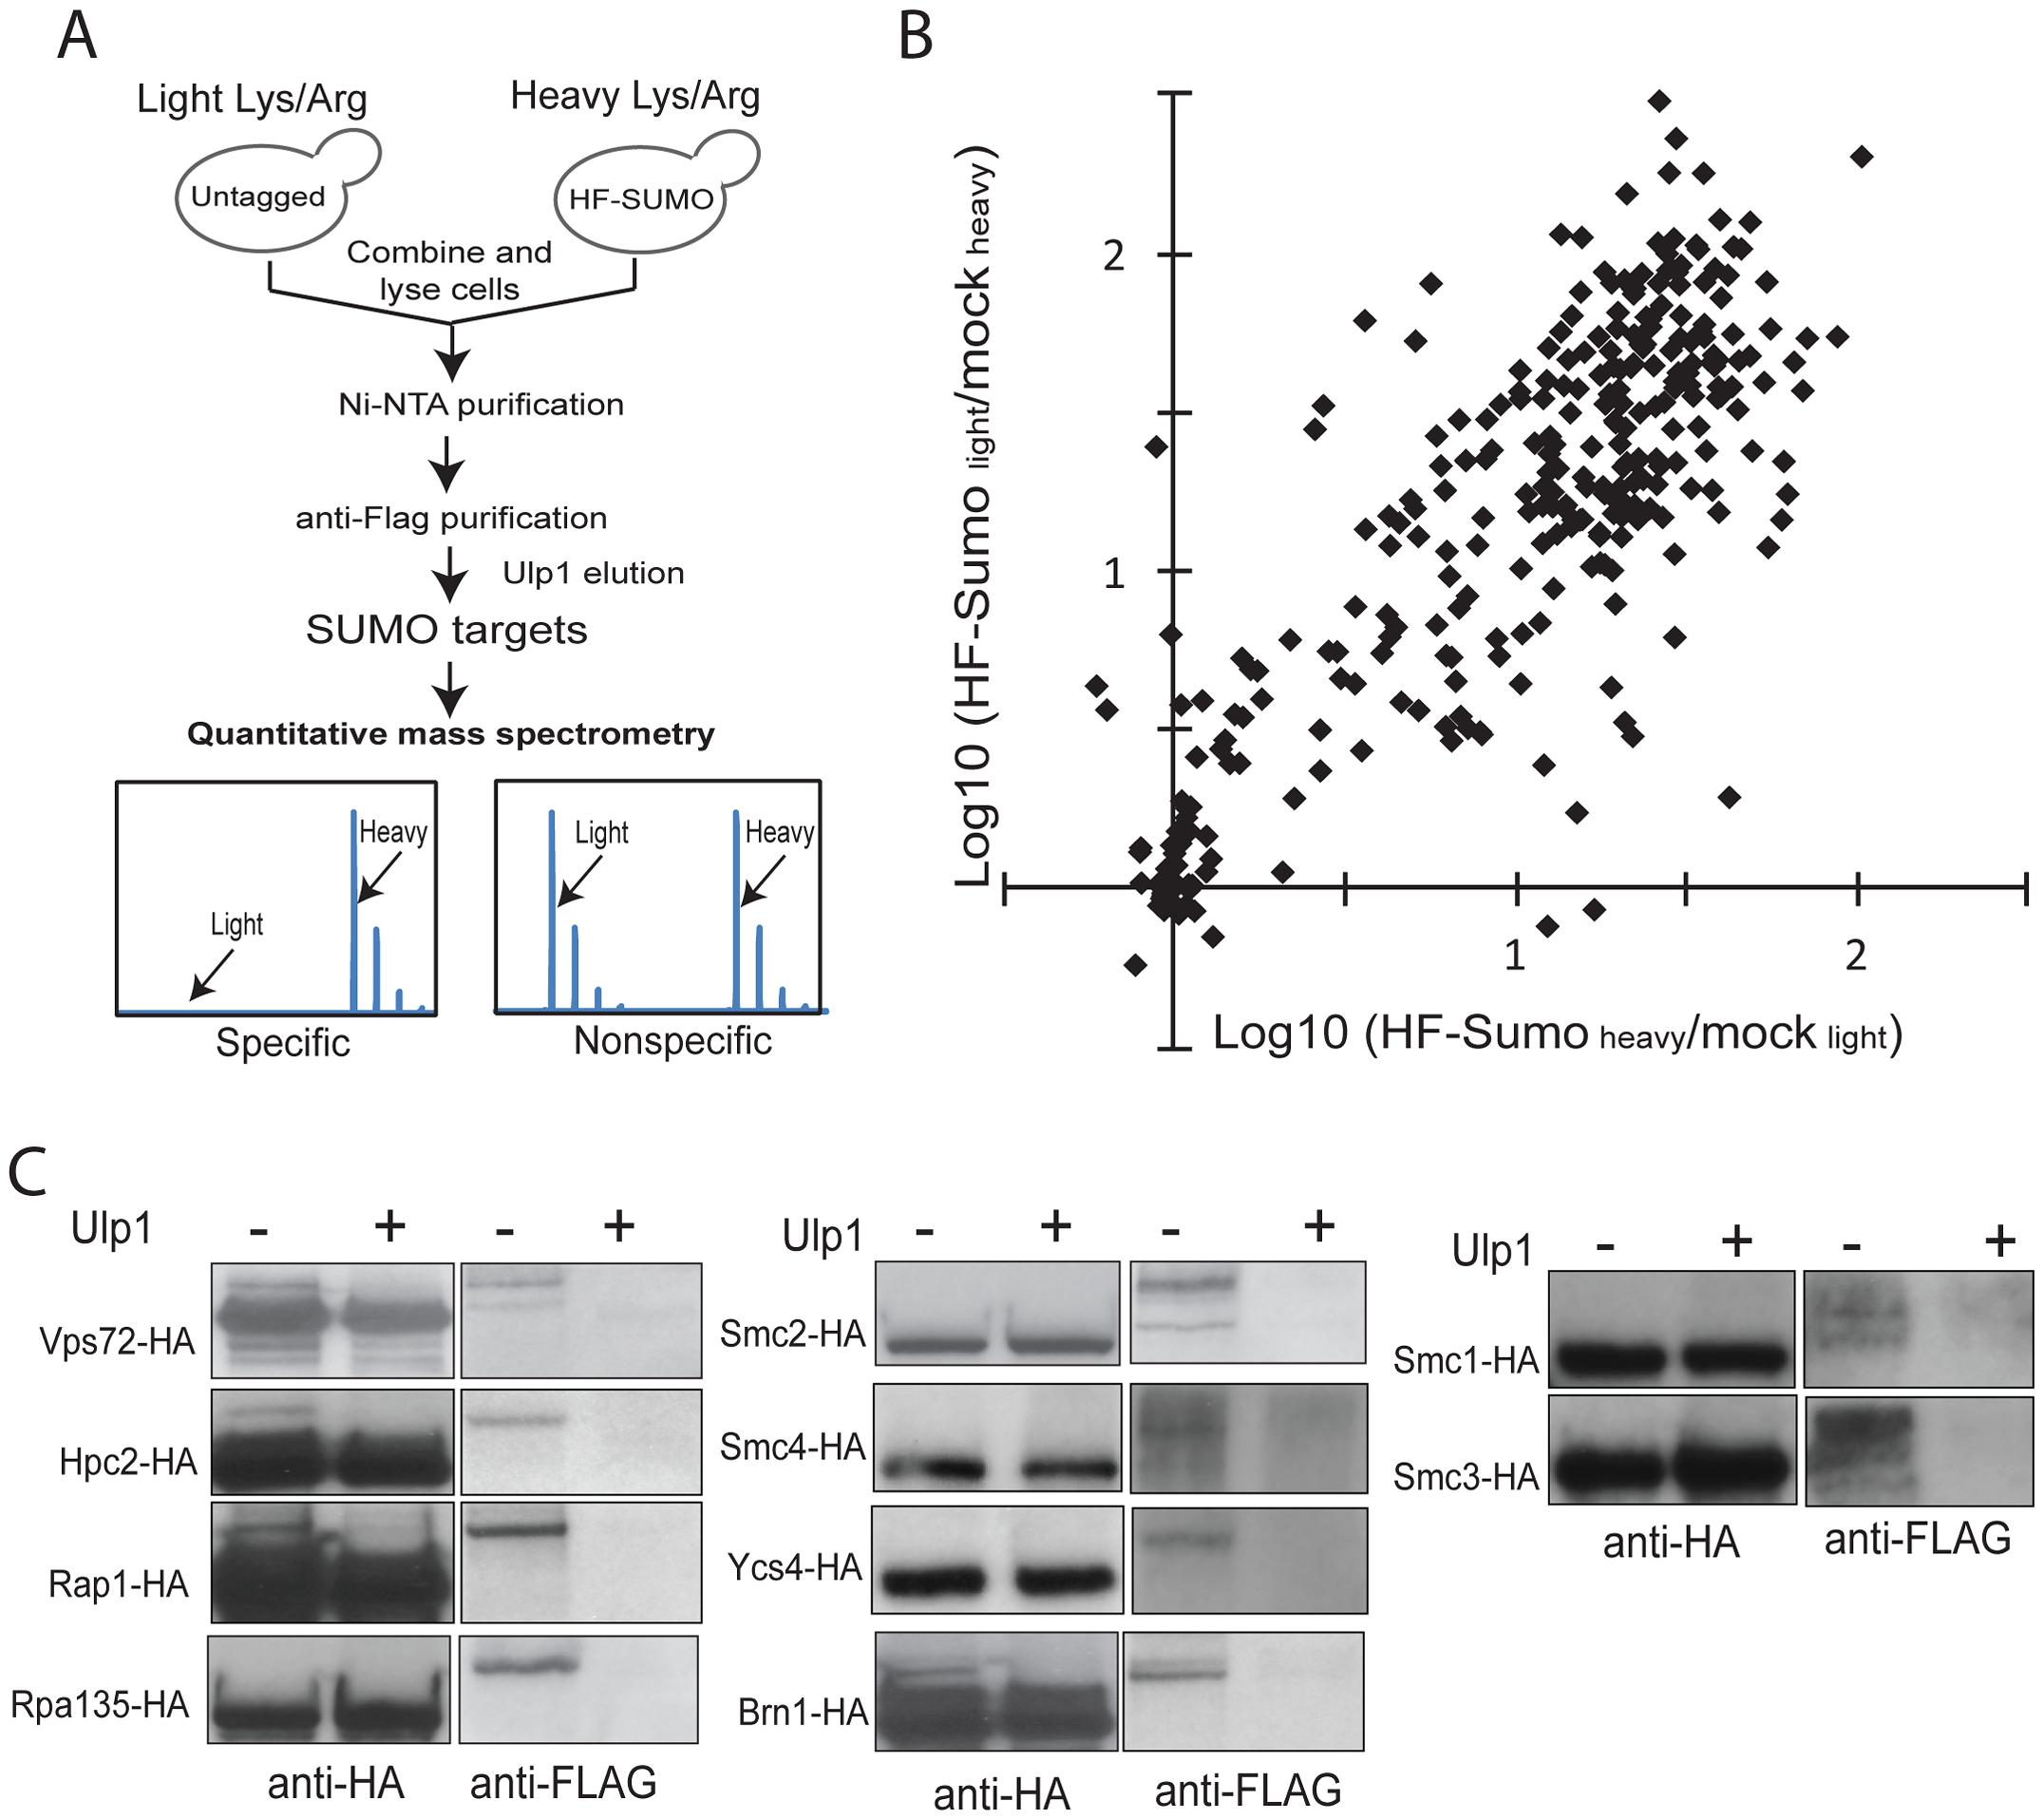 A new quantitative proteomics technology to characterize the SUMO-proteome.